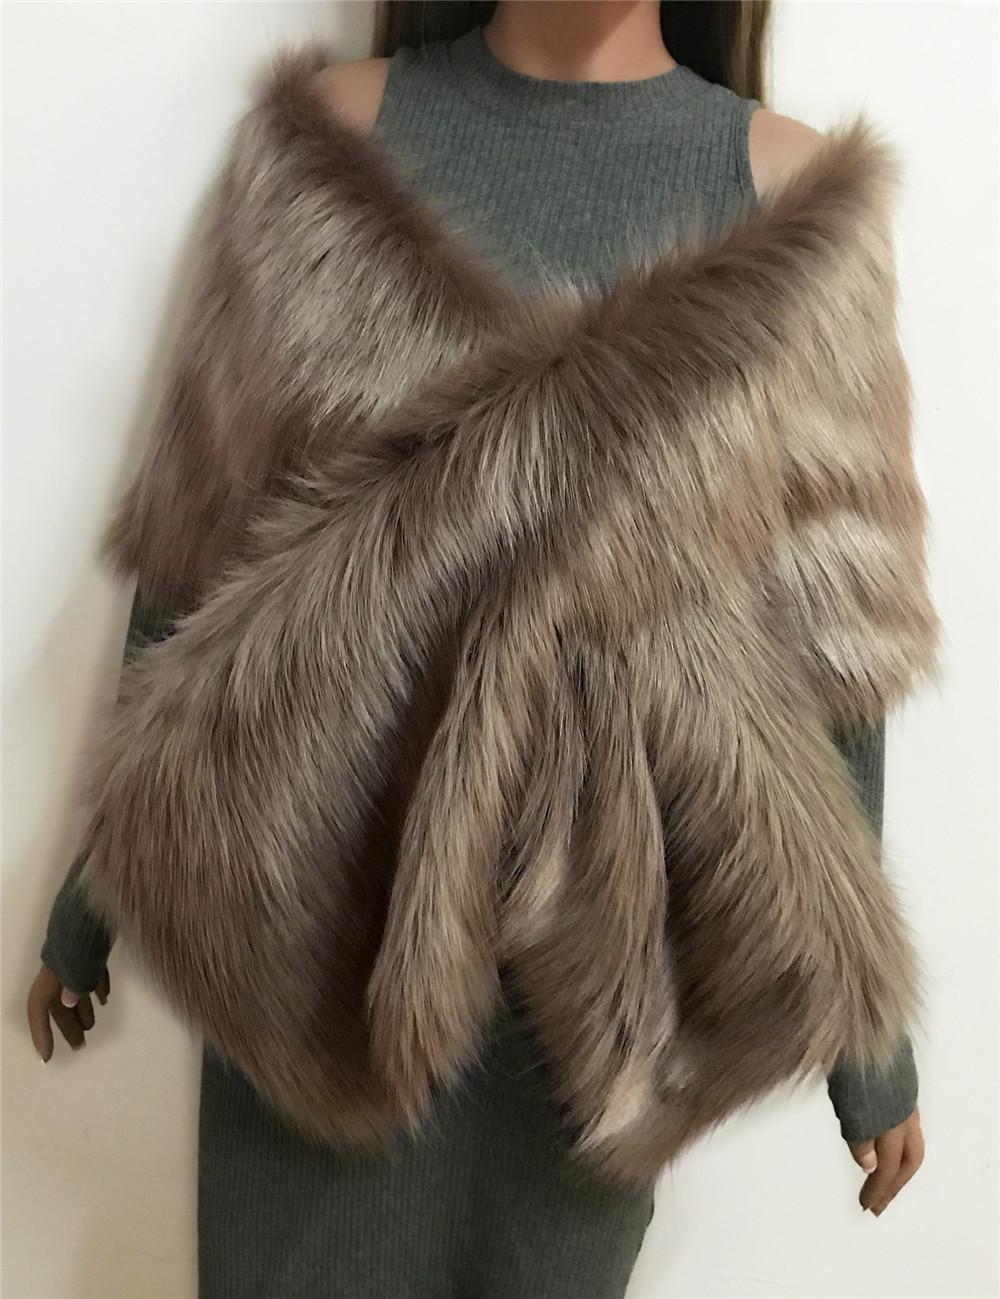 The autumn and winter new imitation fur big cape neck scarf multi-color joker scarf bride dress cross cape (6)